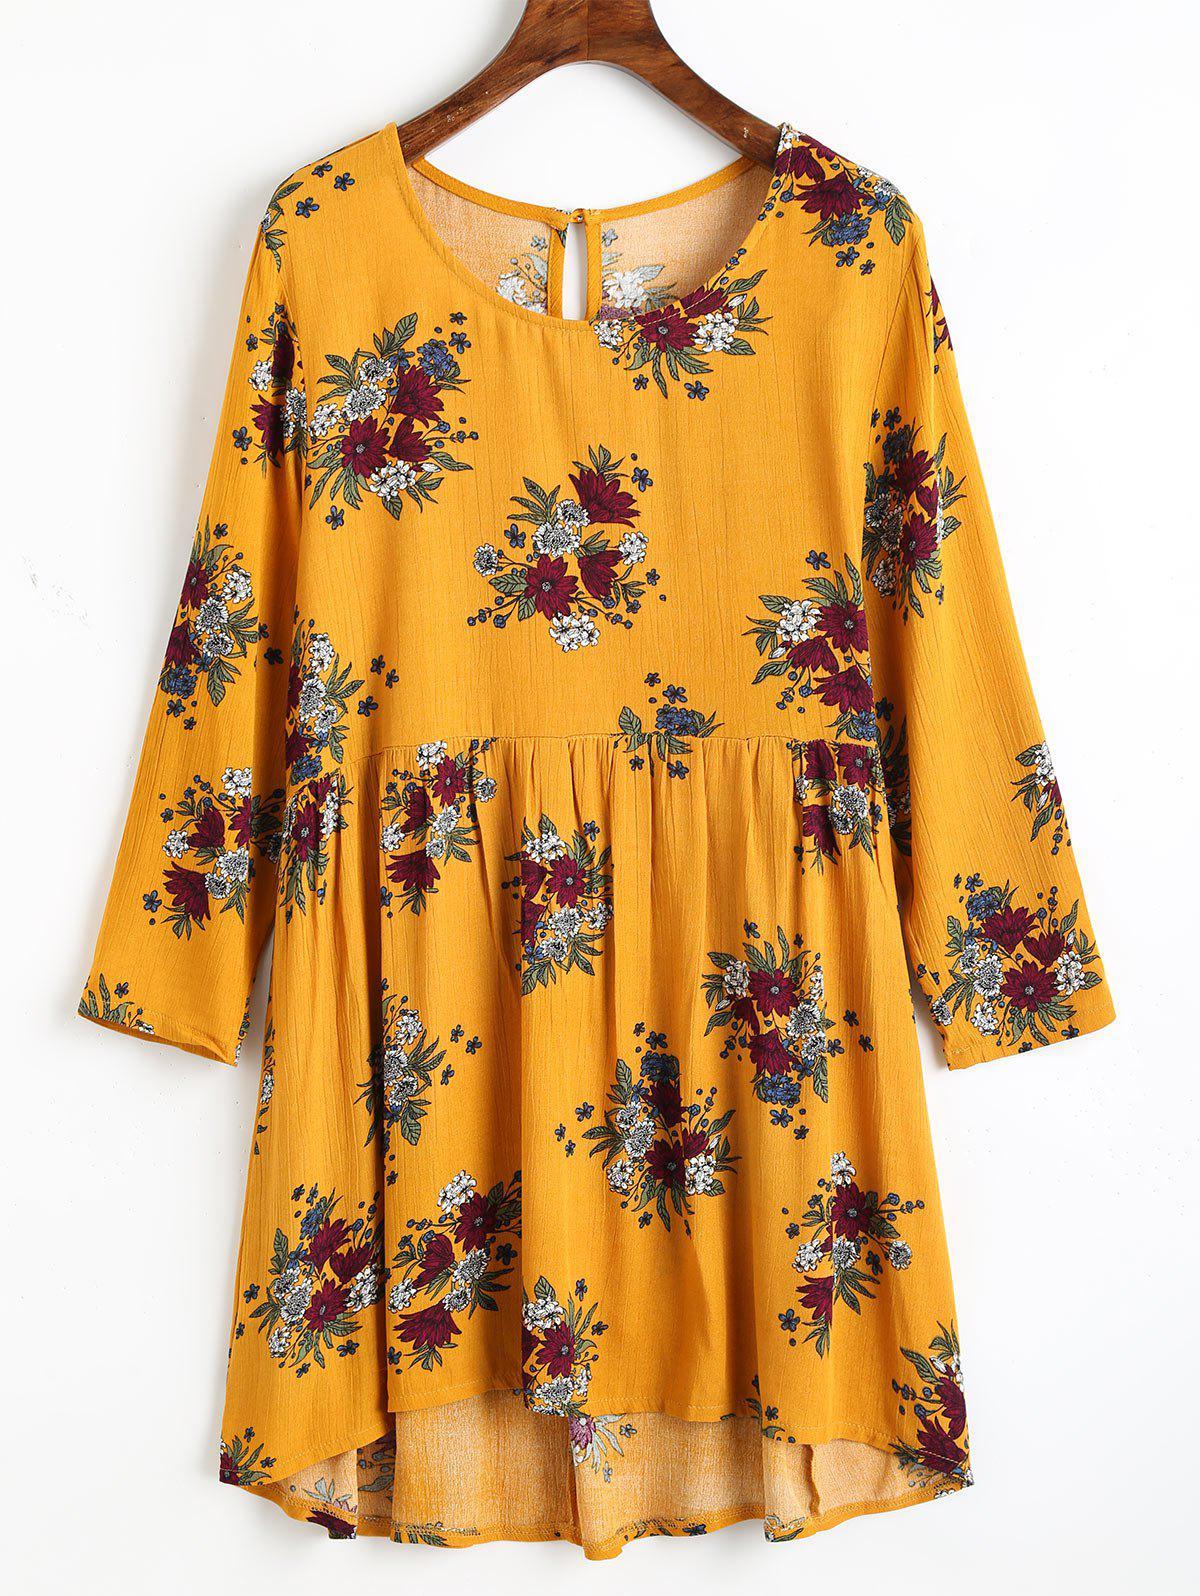 Blumendruck hohe niedrige Bluse